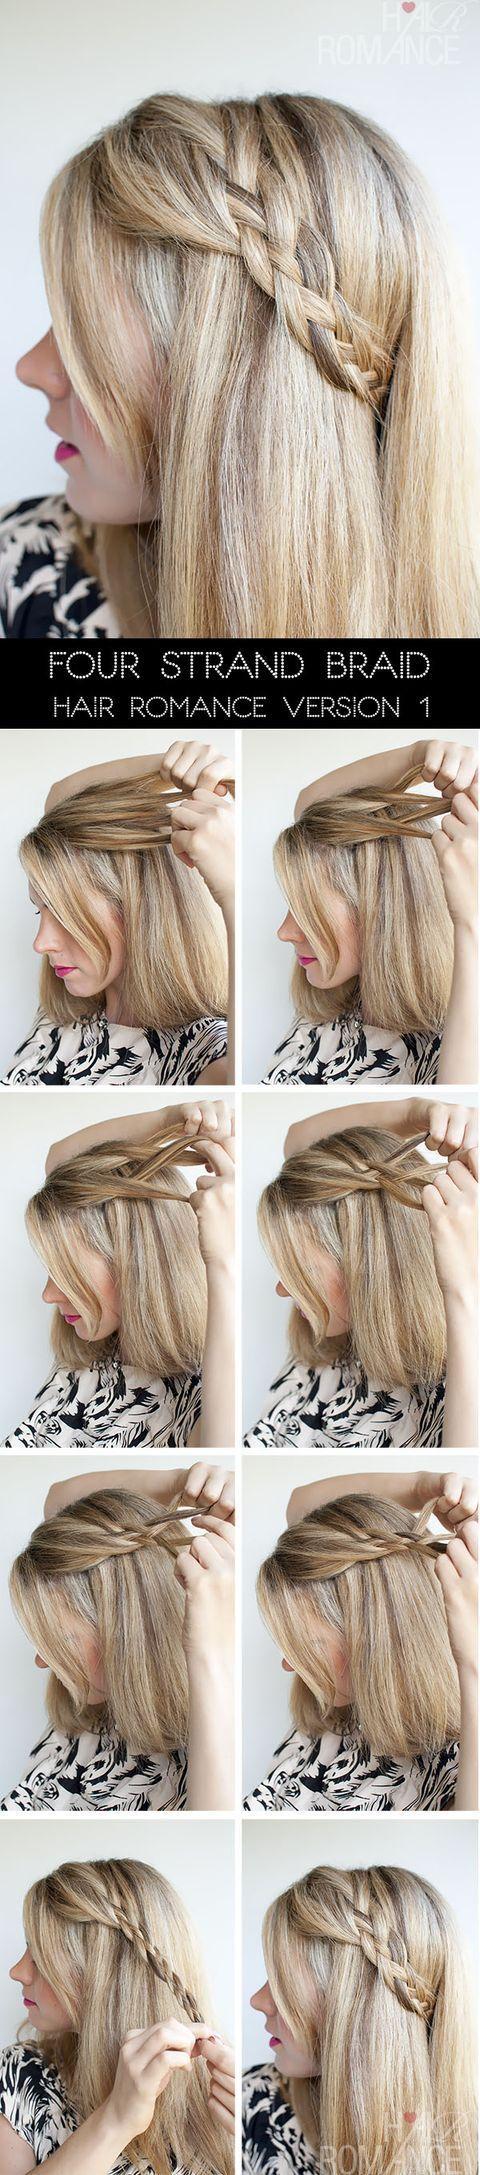 4 strand braids | Four Strand Braids Hairstyle Tutorial